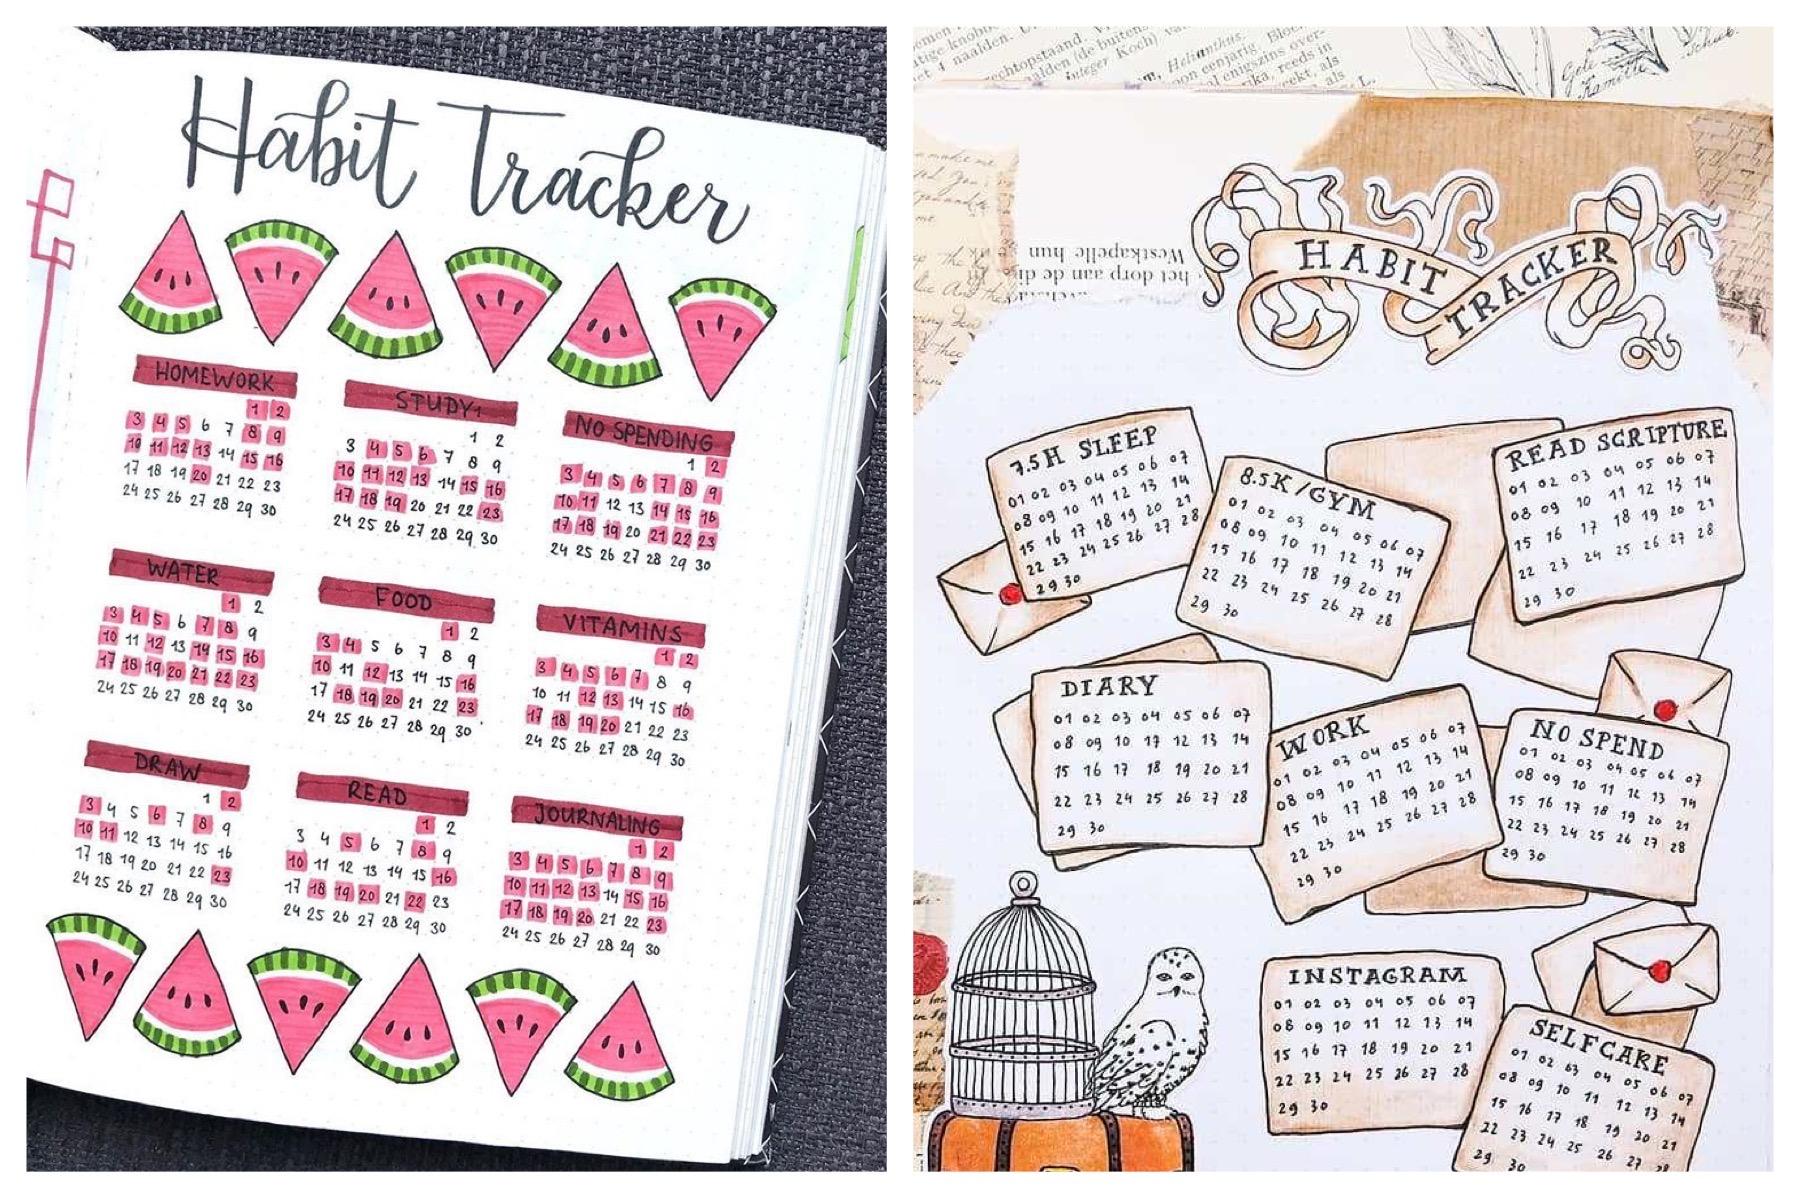 20 Amazing Habit Tracker Ideas for Your Bullet Journal   Bliss Degree